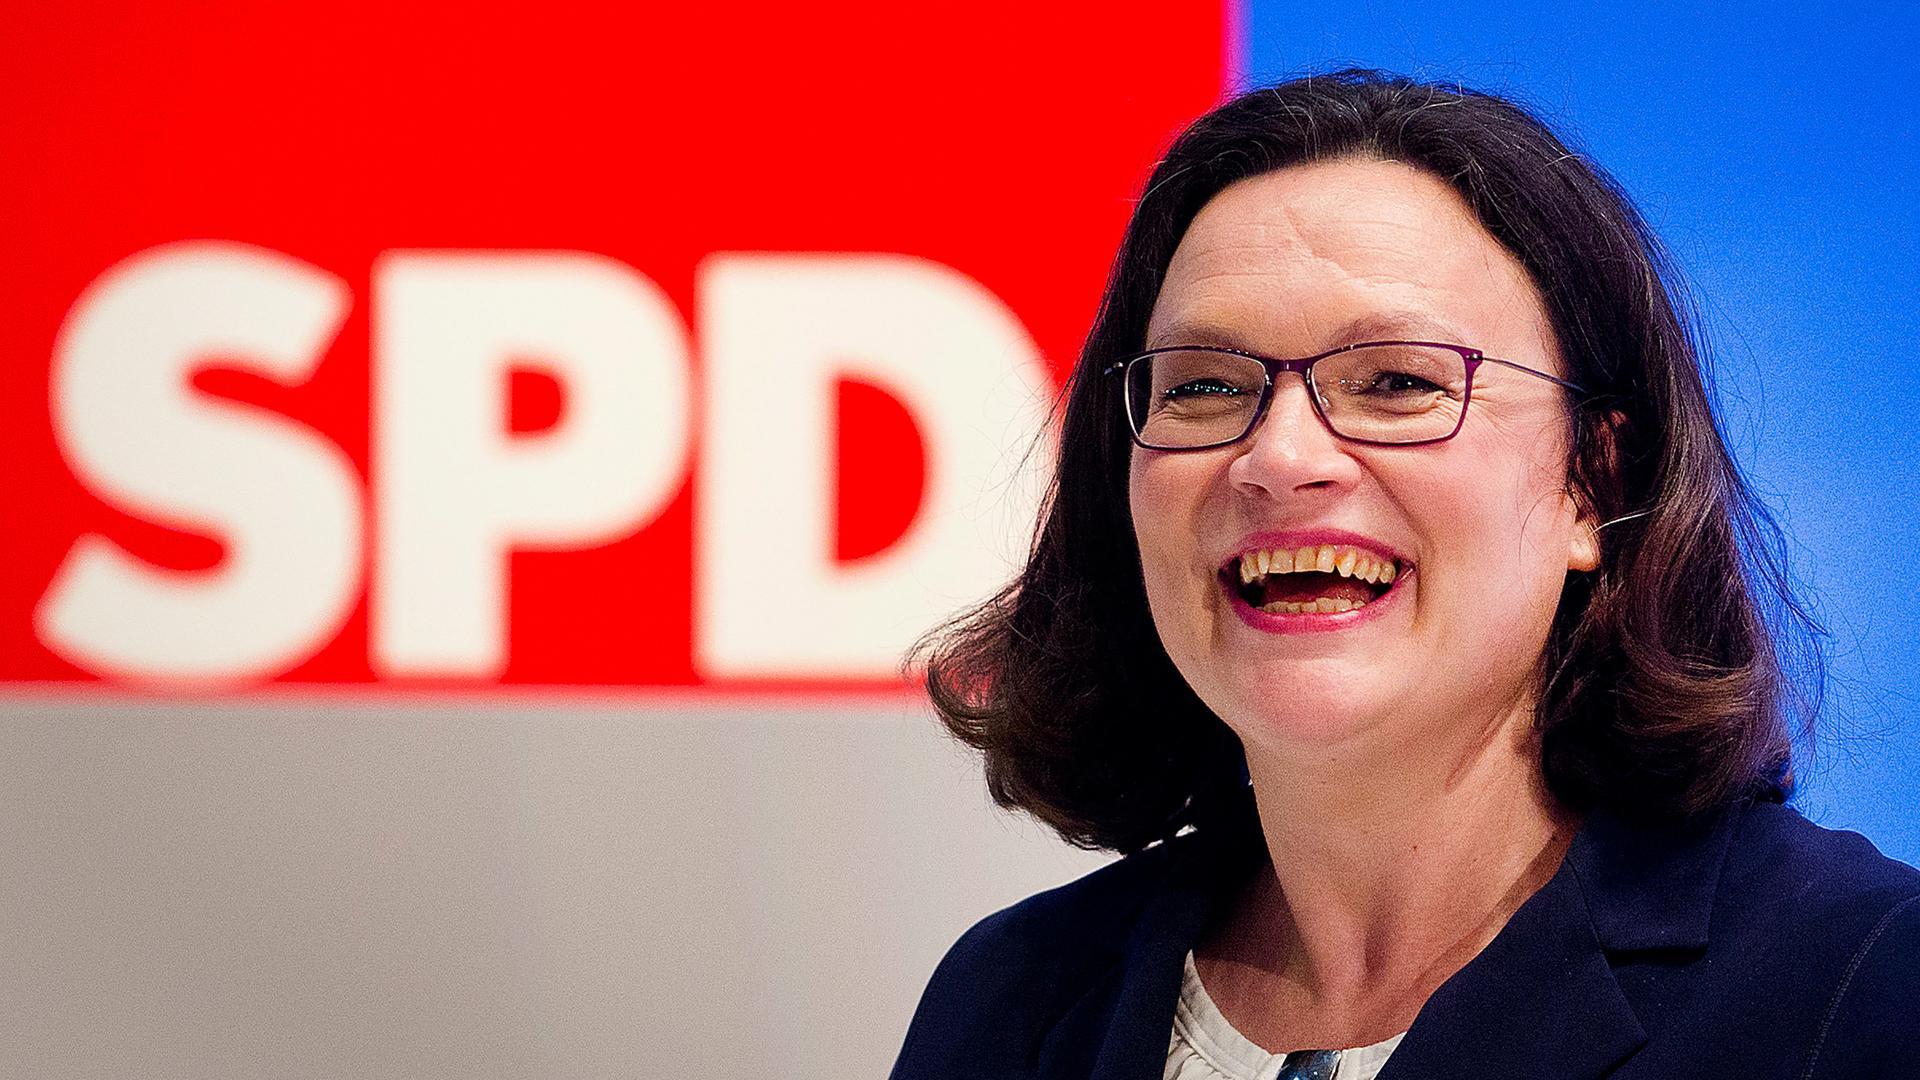 Debakel Für Andrea Nahles ZDFmediathek